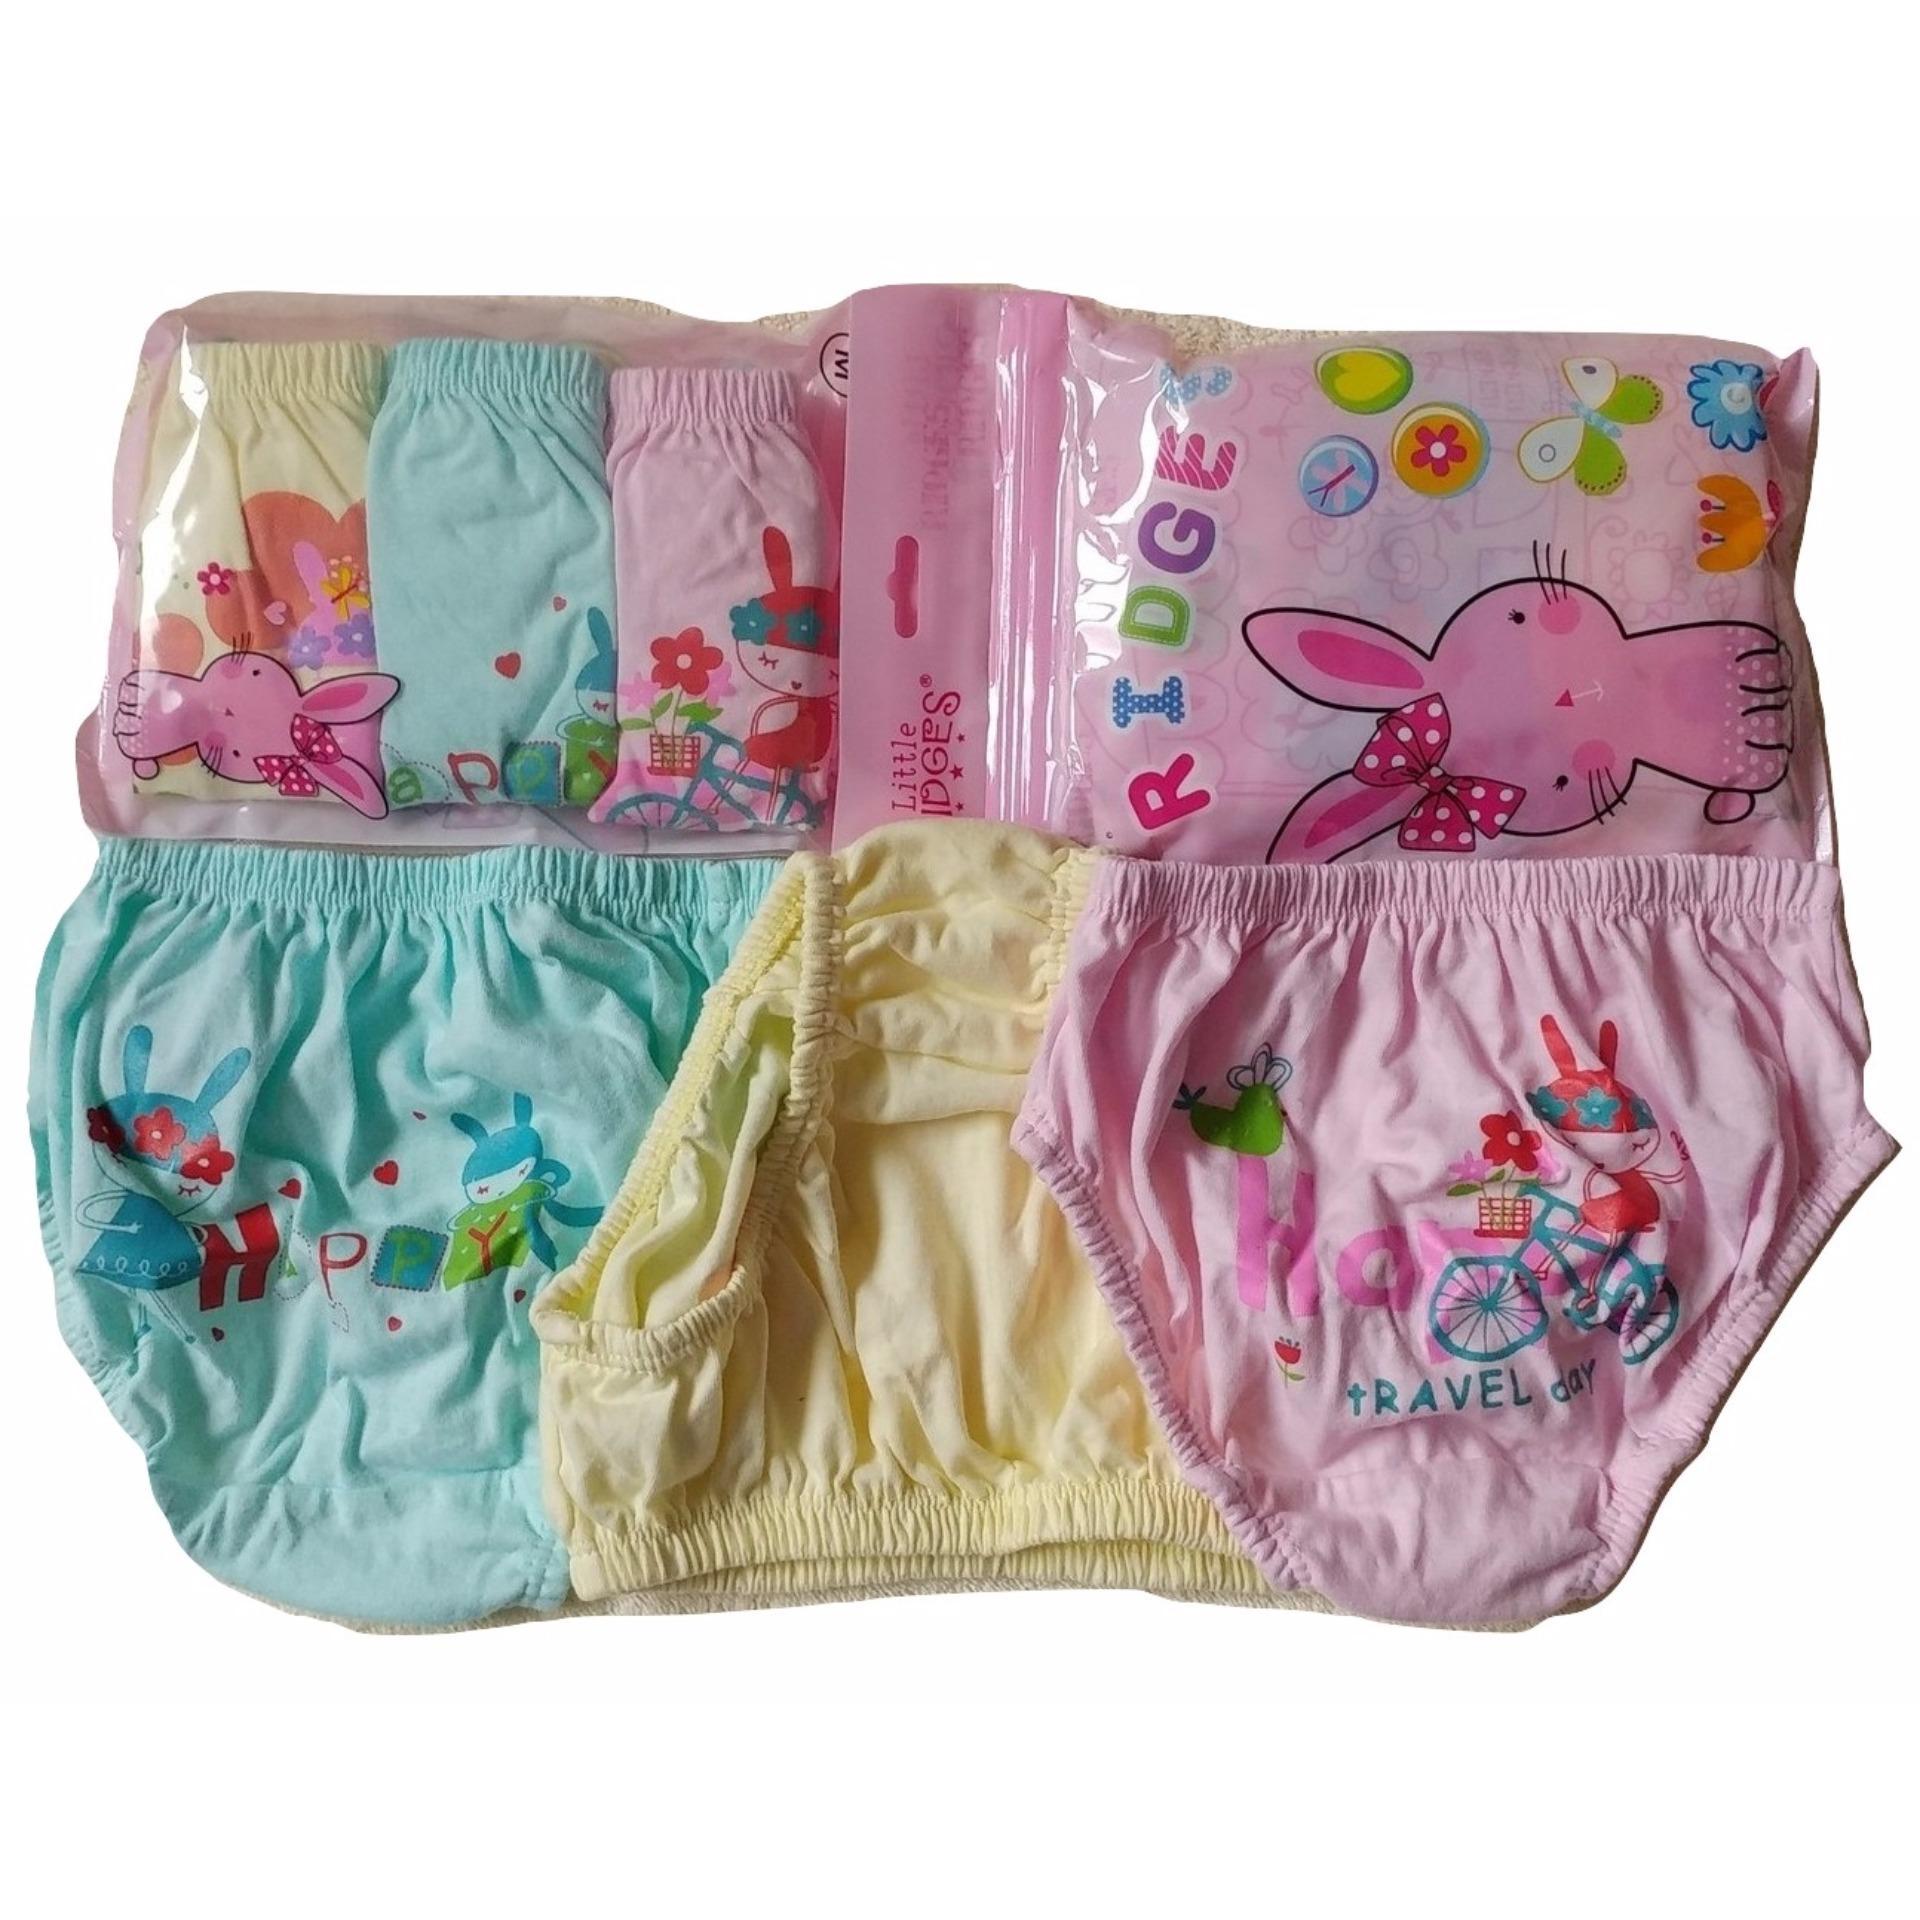 Pencarian Termurah Jelova Angela RIDGES Dalaman Baby GIRLS Kids 1-2 TAHUN - SNI STANDART